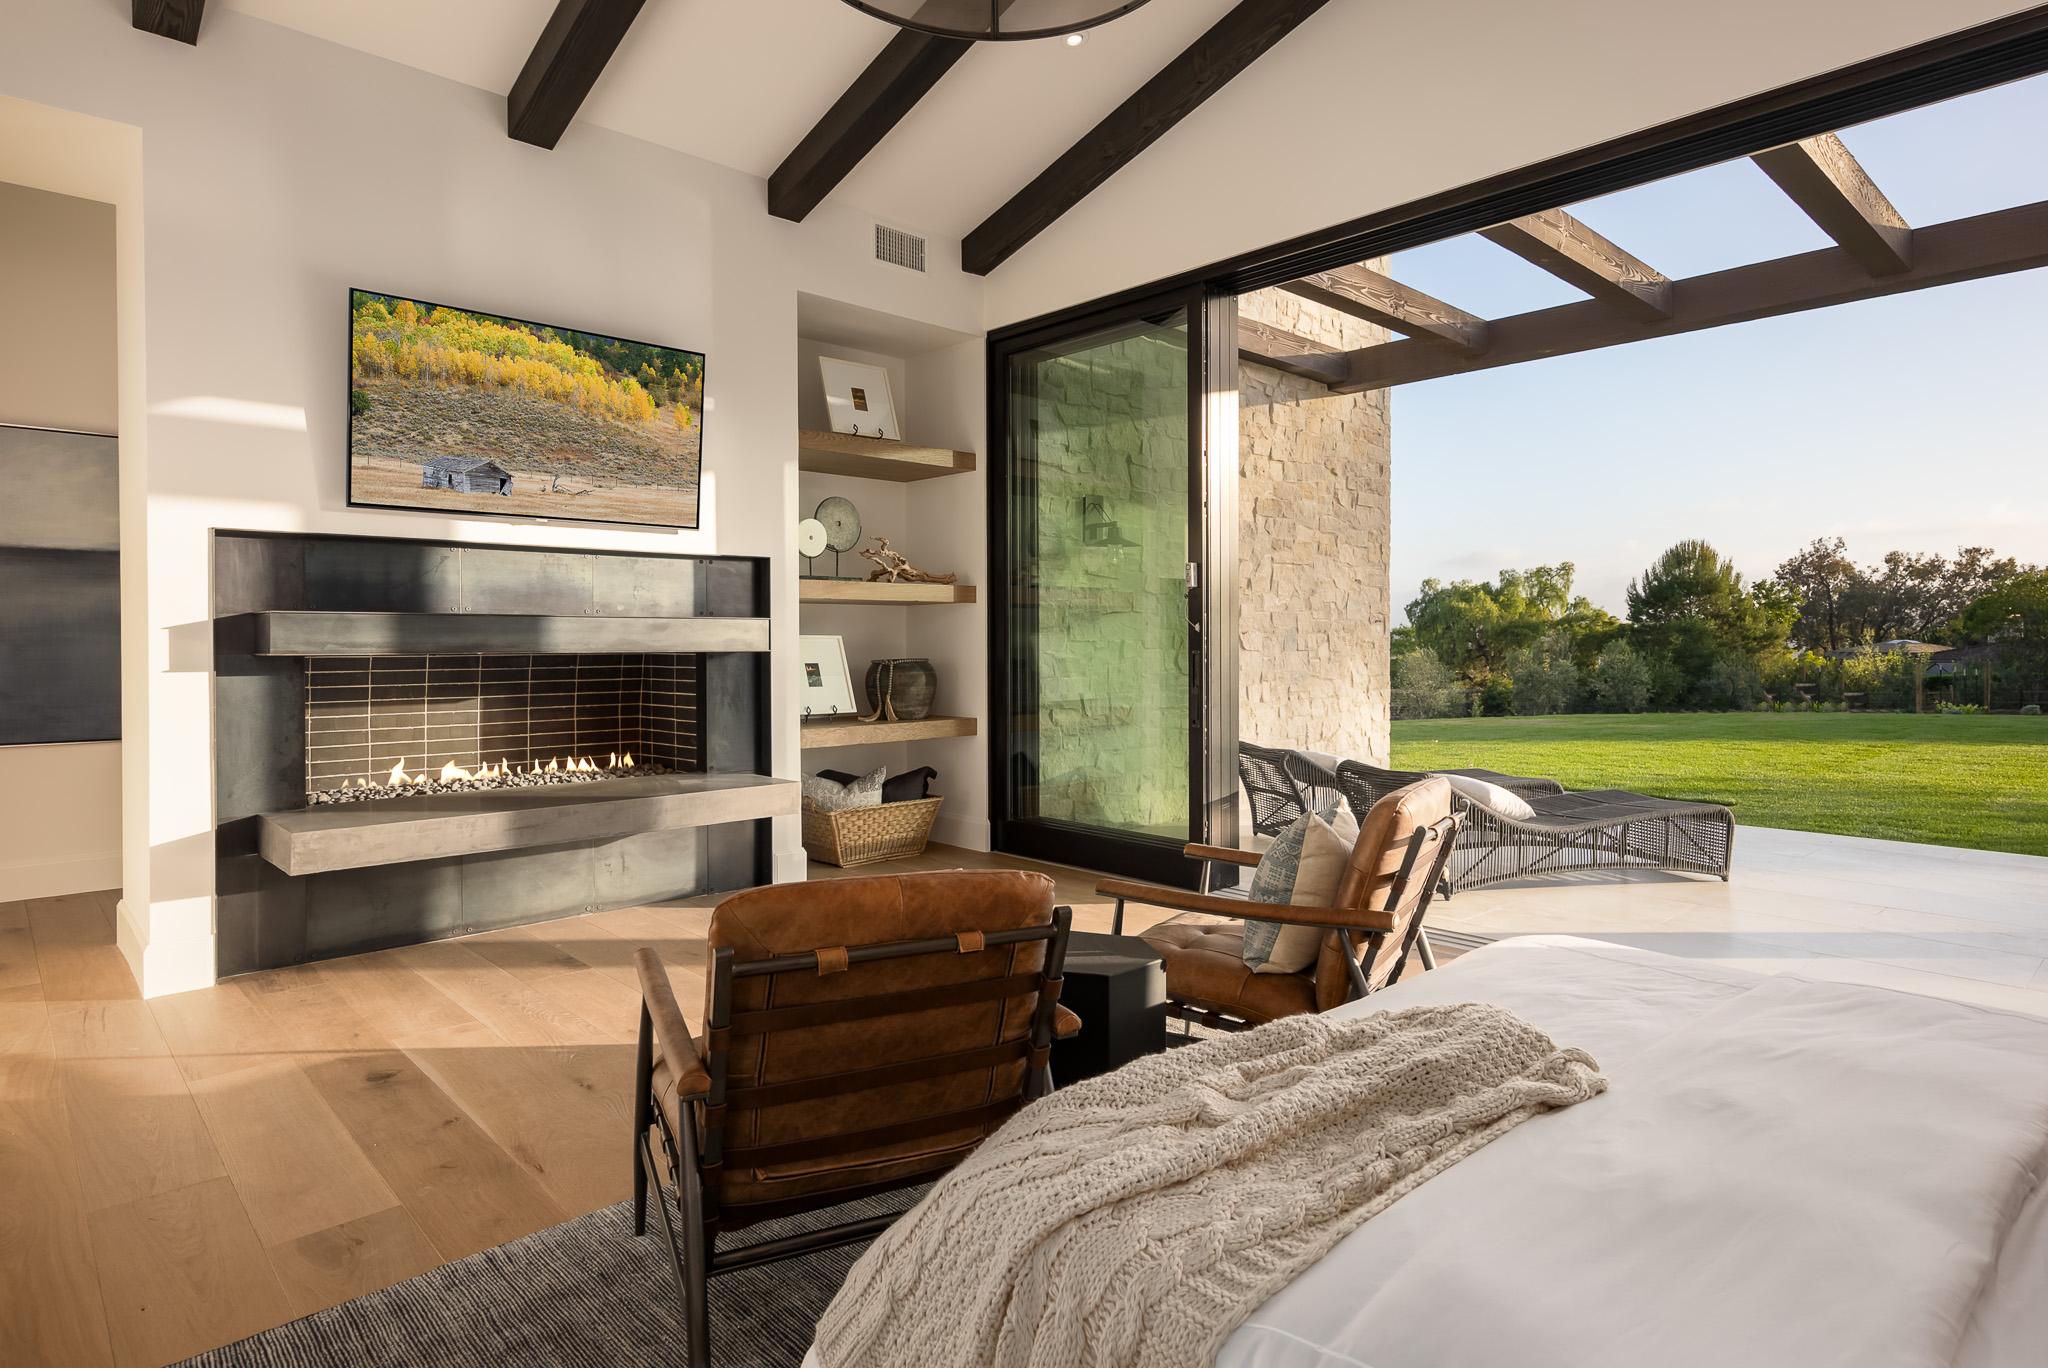 Sold 2021 Laura Represented Seller -  Rancho Santa Fe, CA 92067